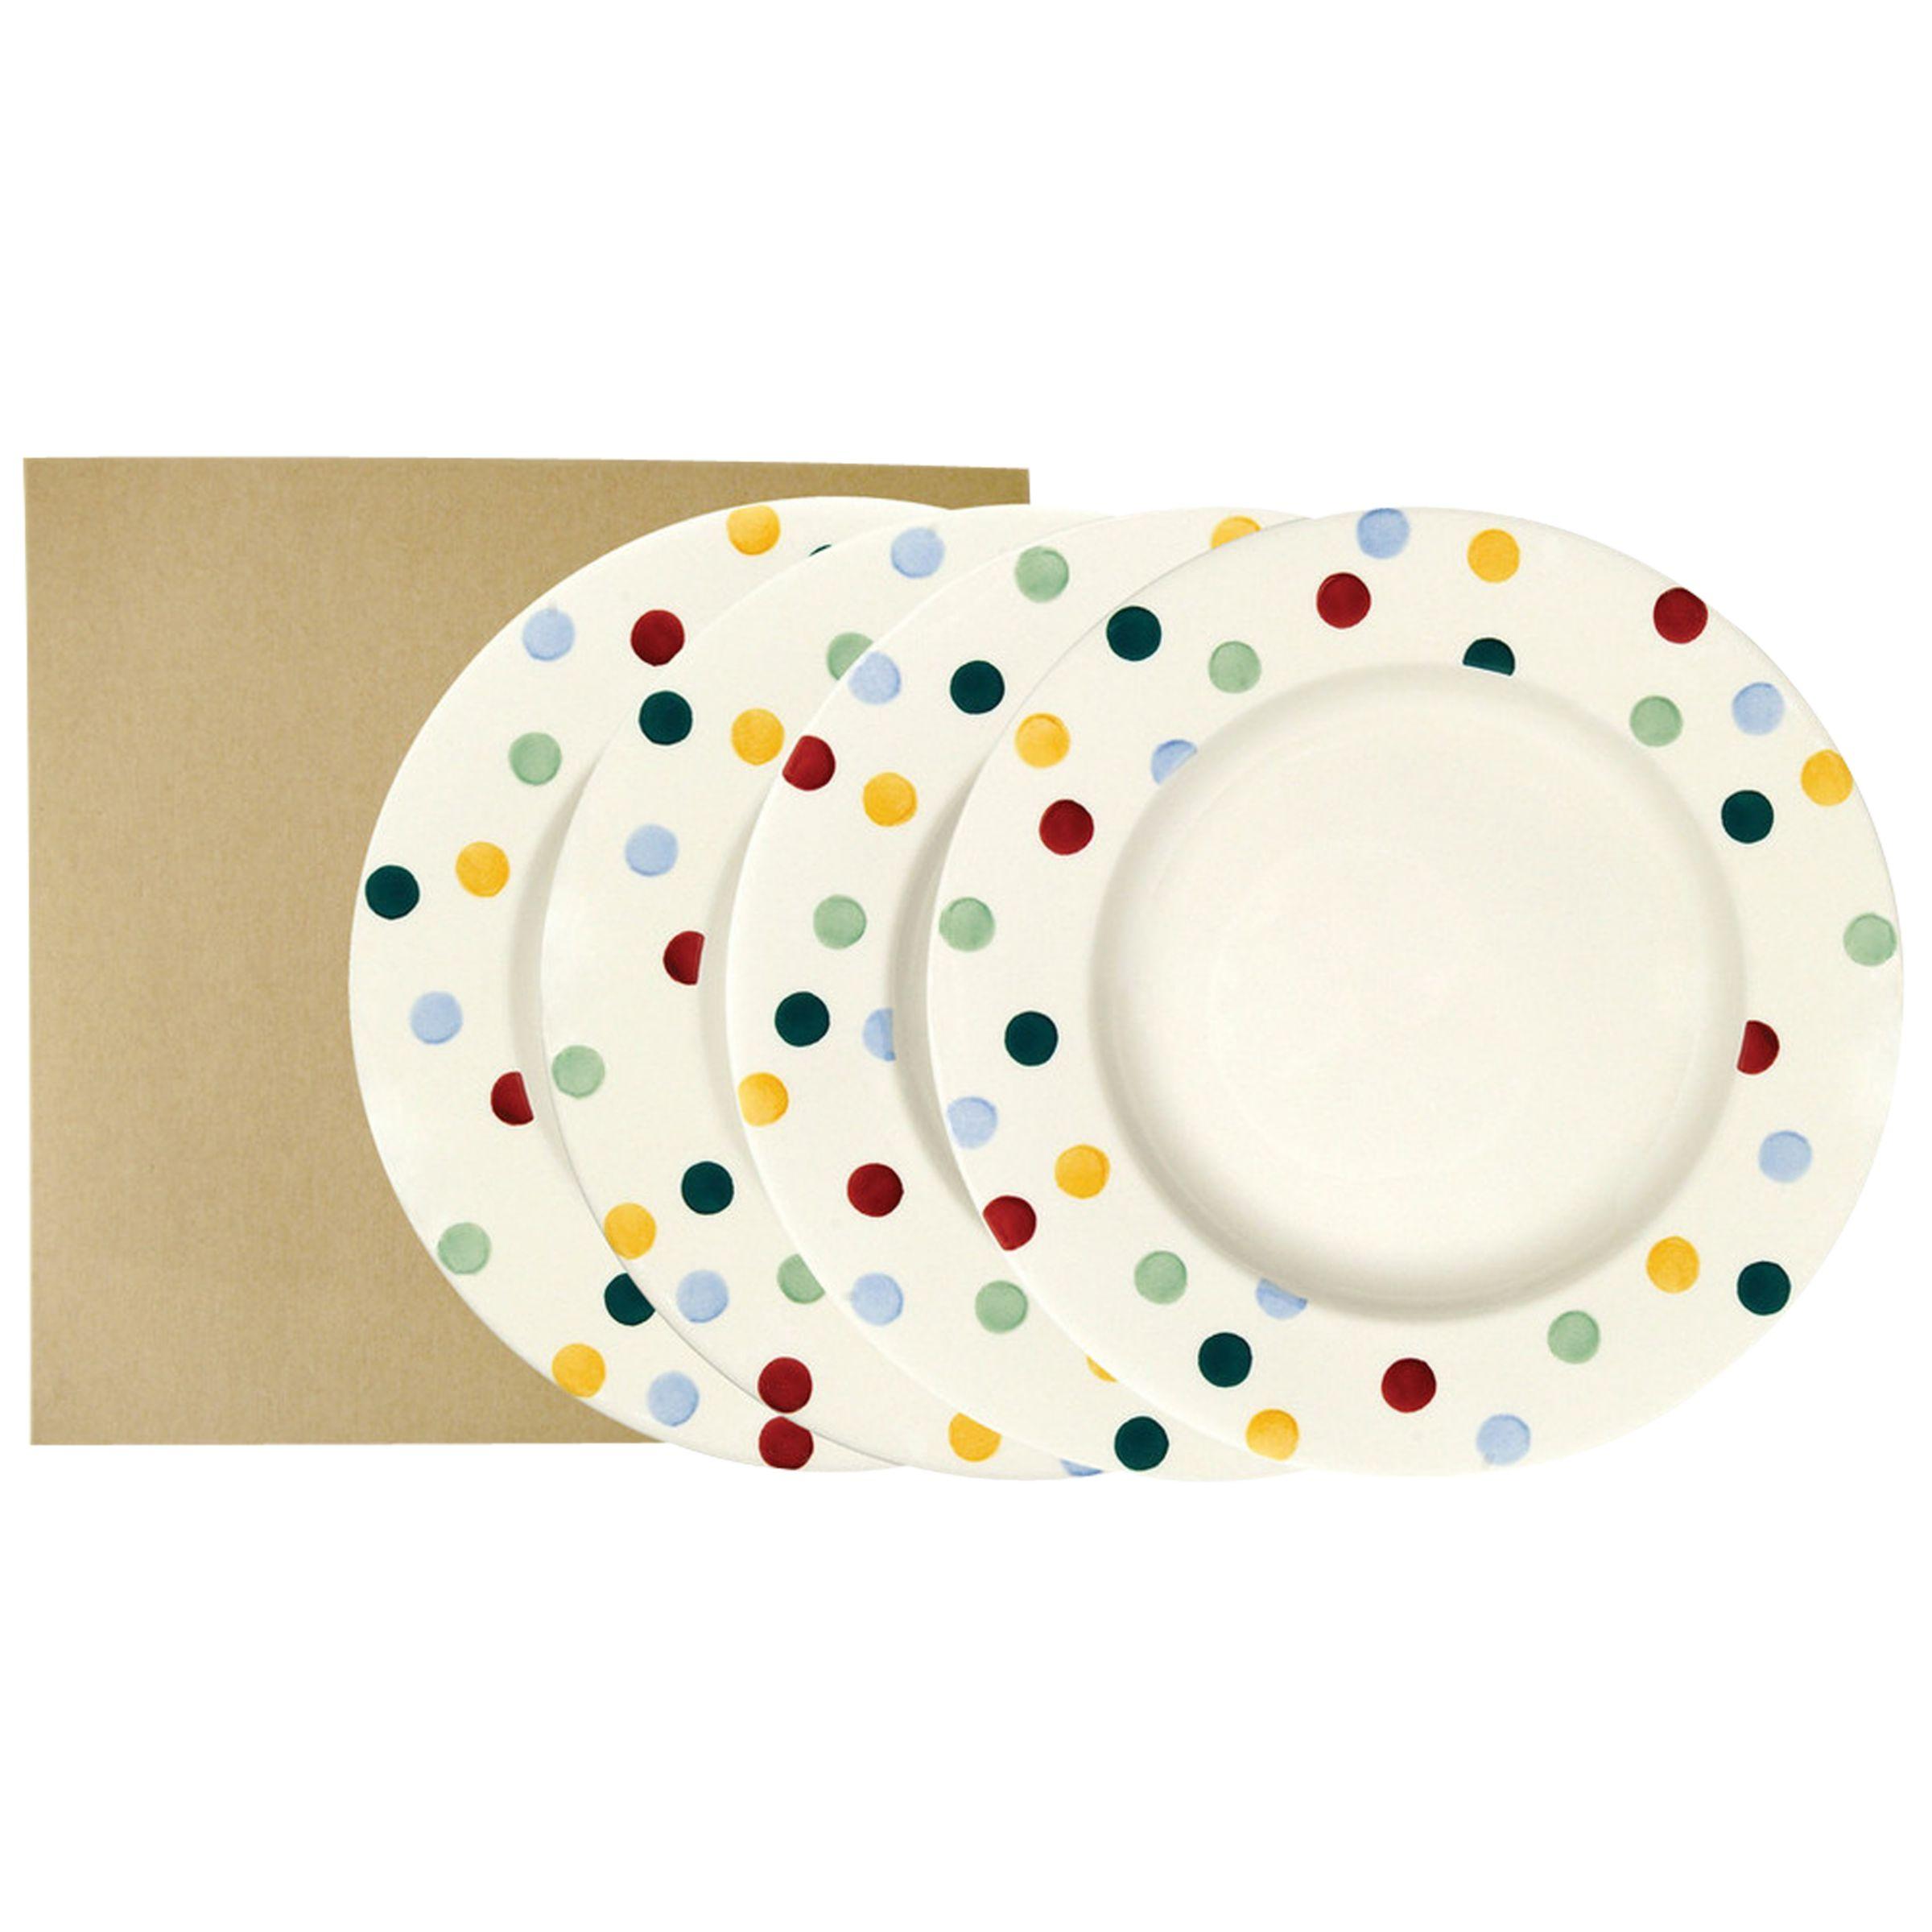 Emma Bridgewater Emma Bridgewater Polka 28cm Plates, Set of 4